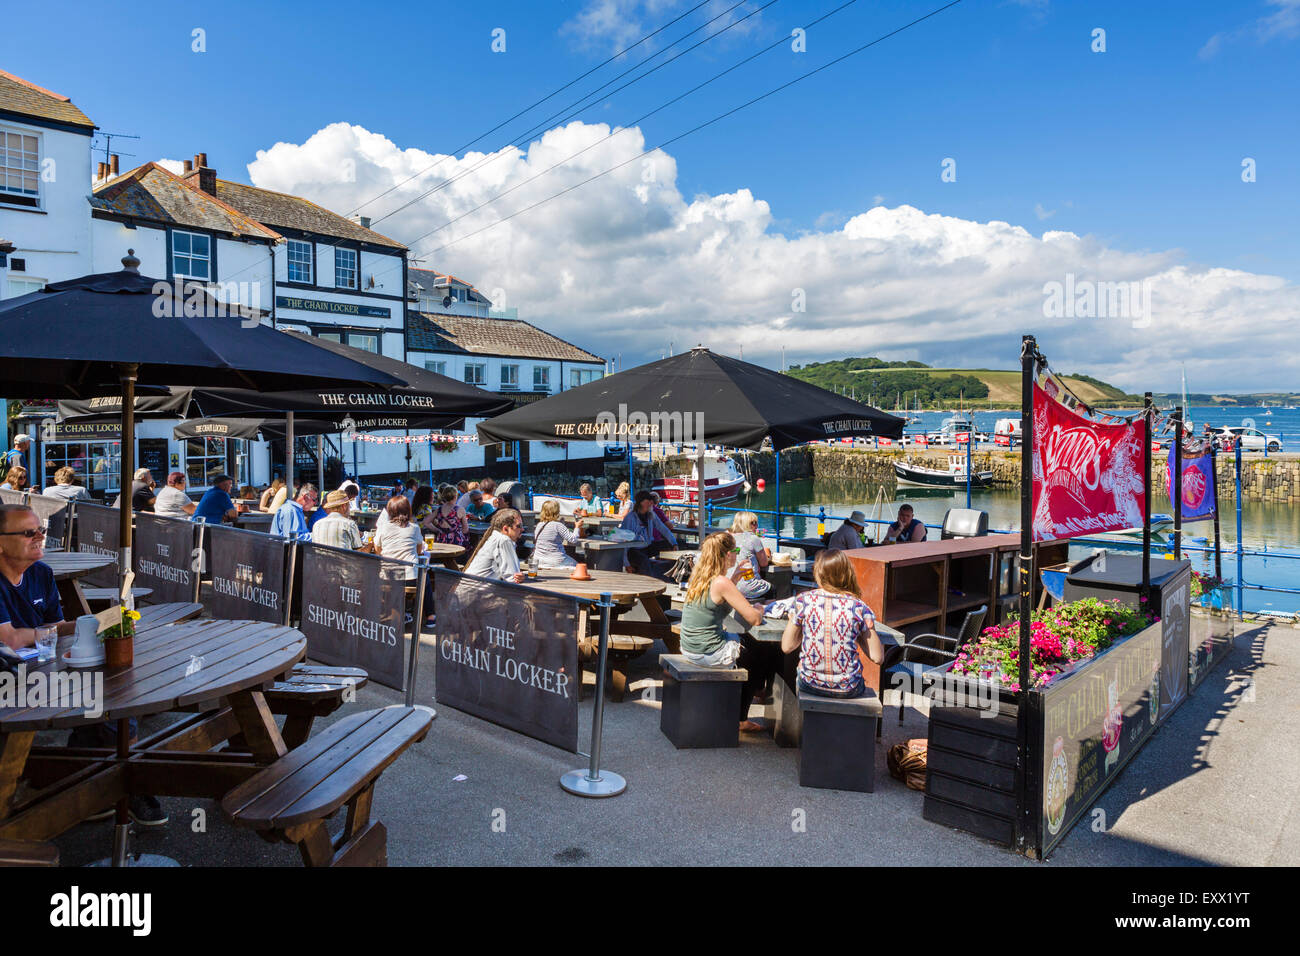 Der Kettenkasten Pub auf Custom House Quay, Falmouth, Cornwall, England, UK Stockbild